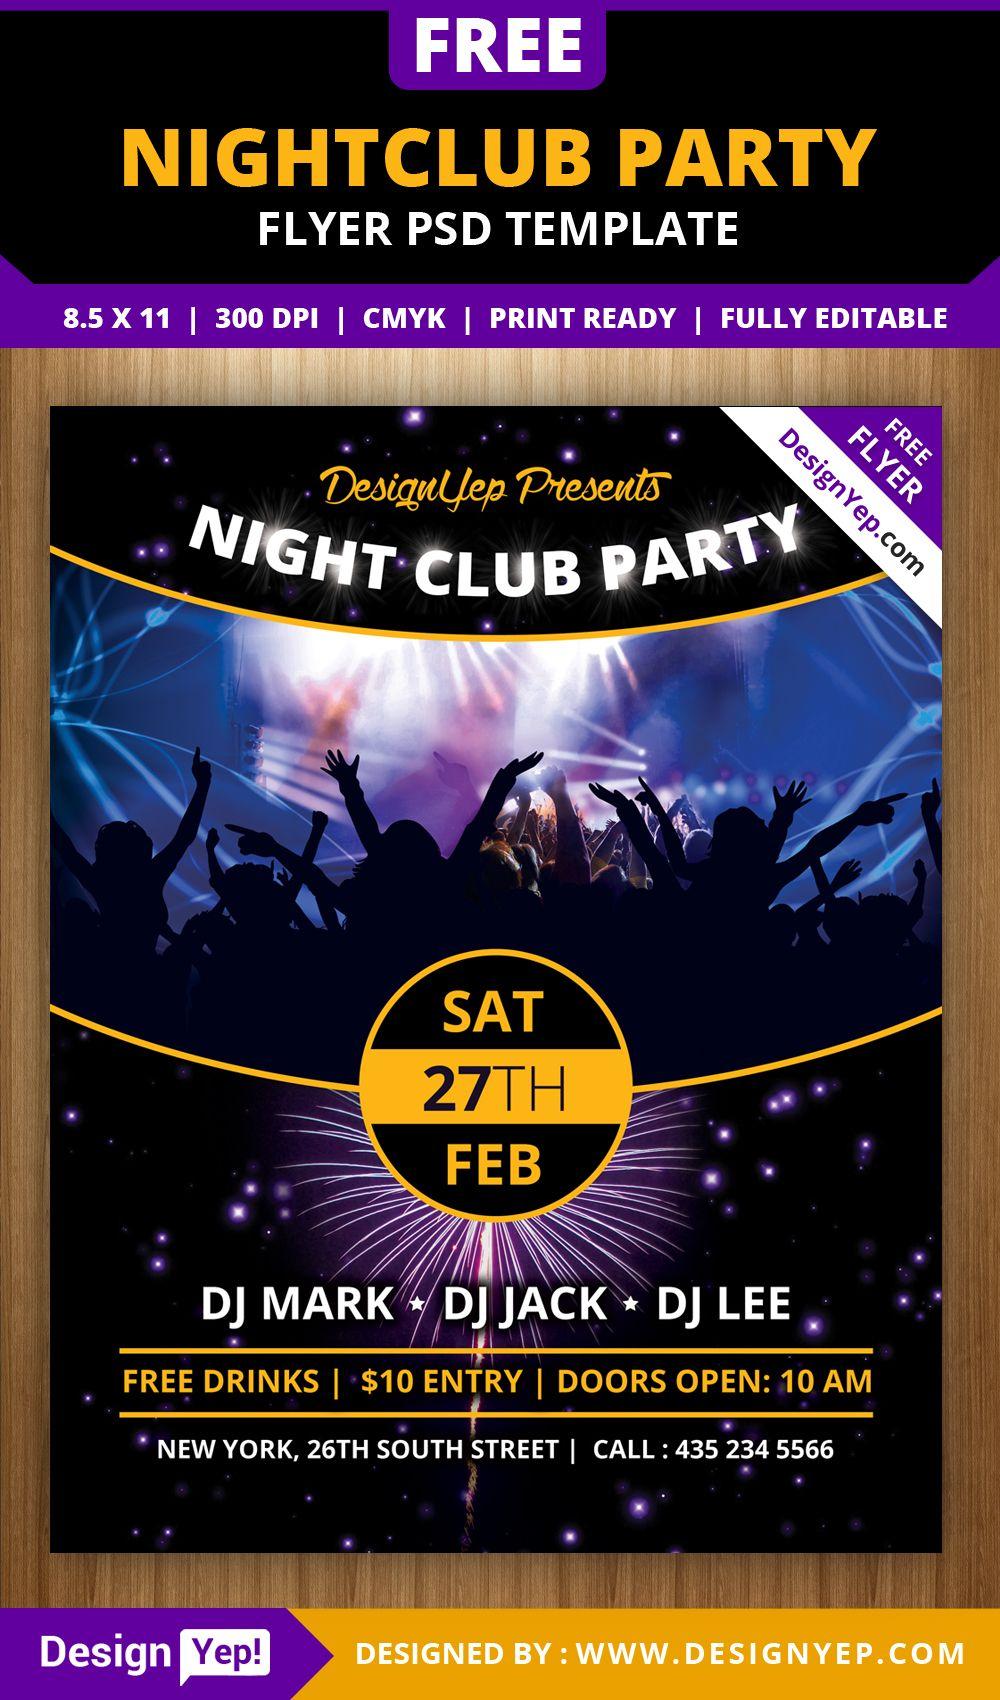 free nightclub party flyer psd template 5624 desingyep free flyers